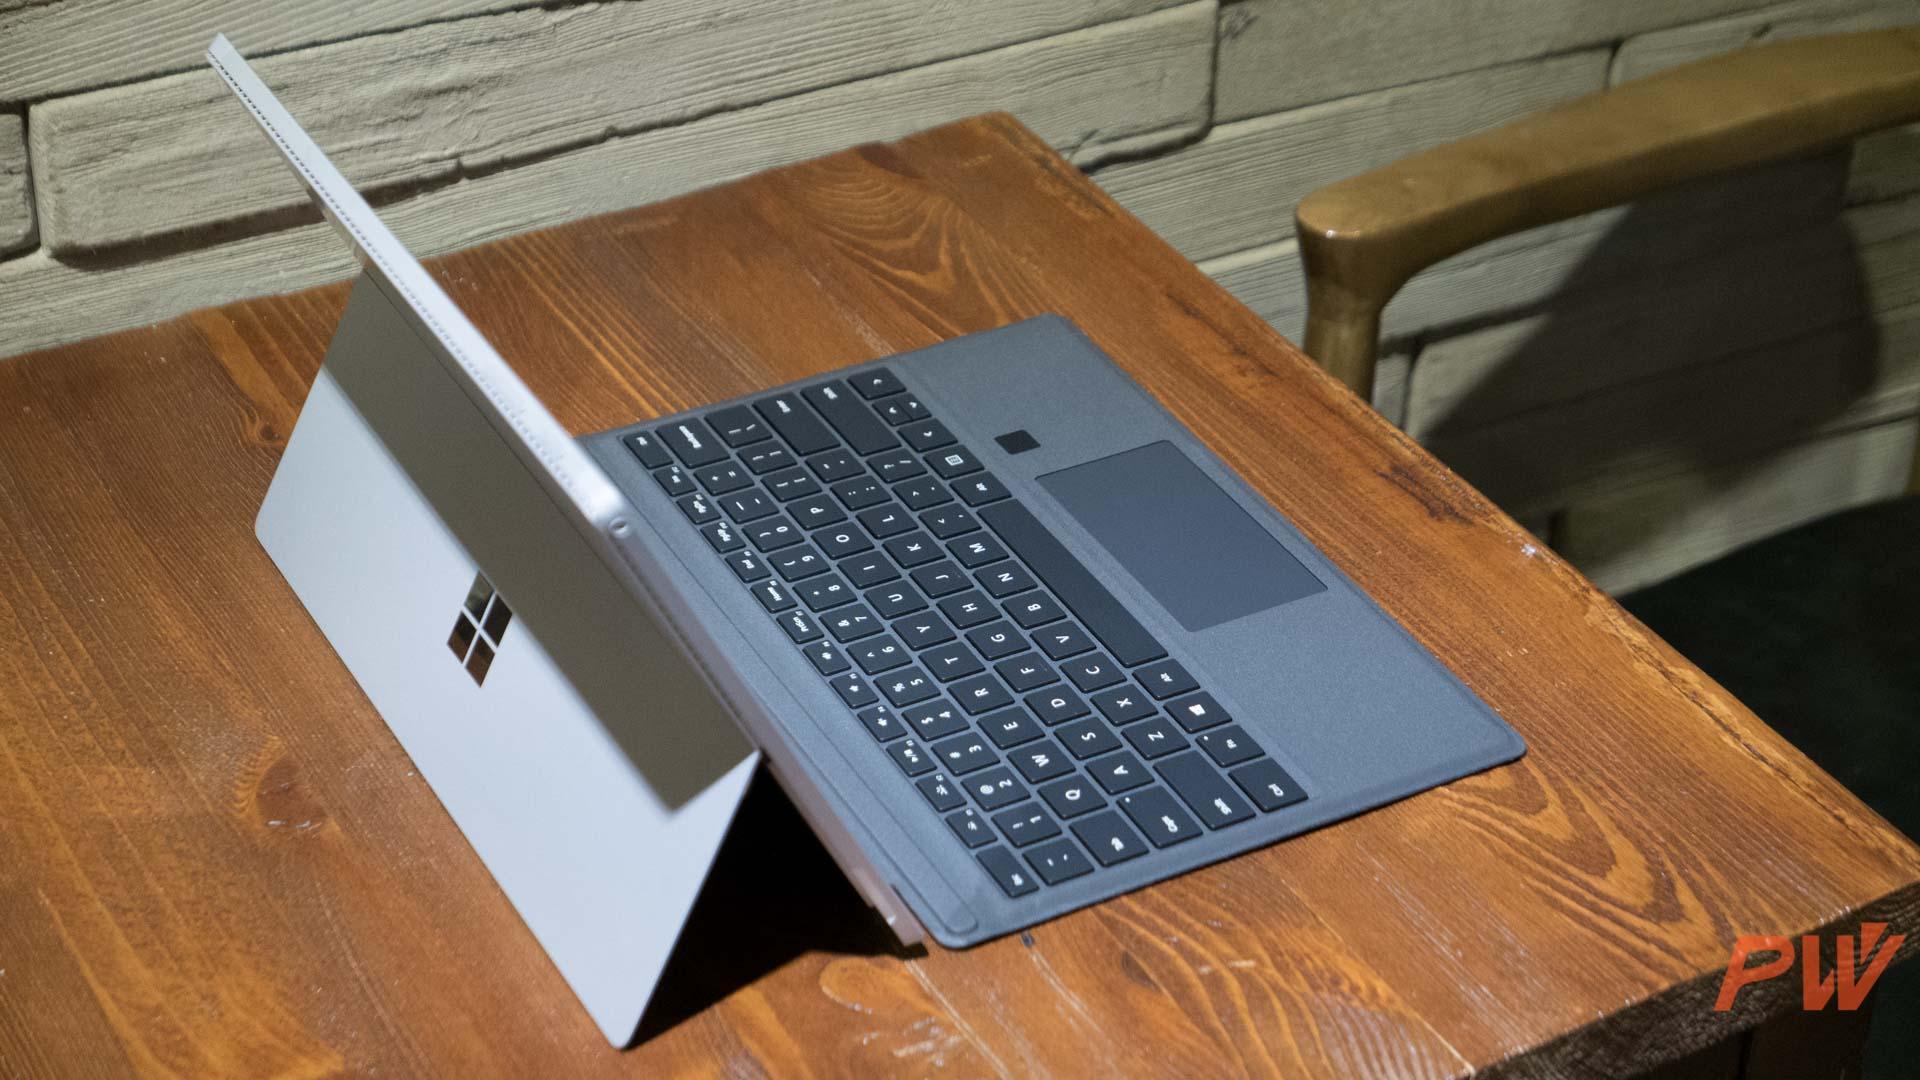 Surface Pro 开创了二合一市场。图为 Surface Pro 4。